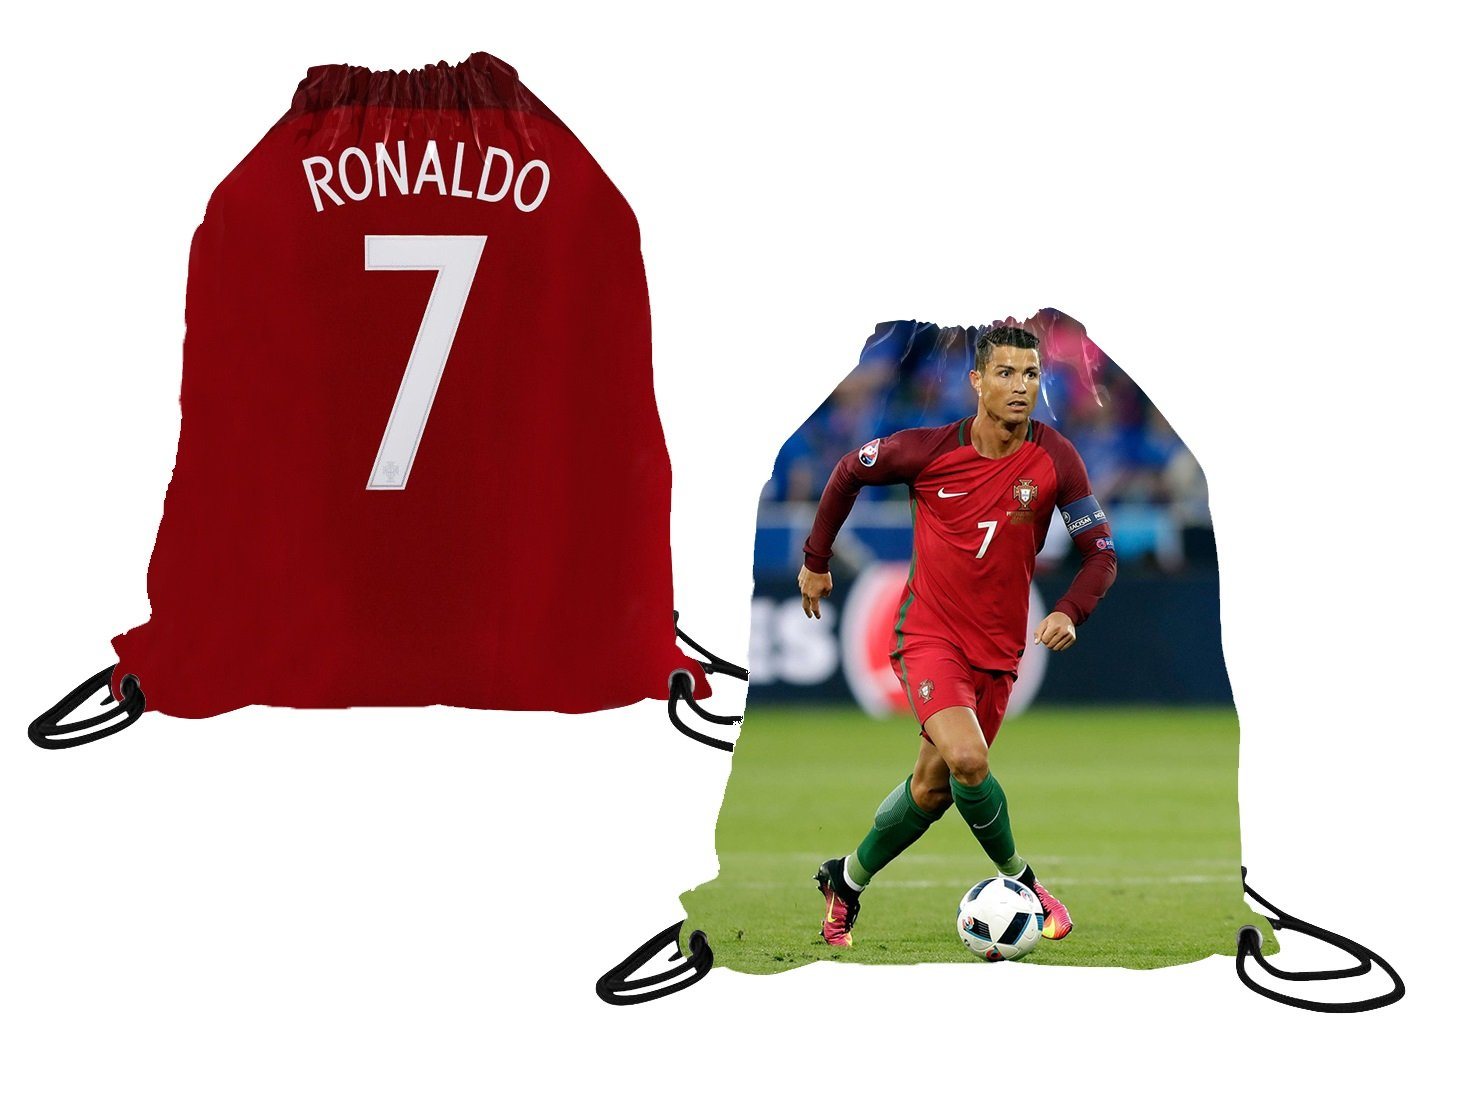 Ronaldo Jersey Style T-shirt Kids Cristiano Ronaldo Jersey Portugal T-shirt Gift Set Youth Sizes ✓ Premium Quality ✓ Soccer Backpack Gift Packaging Fanatics Life